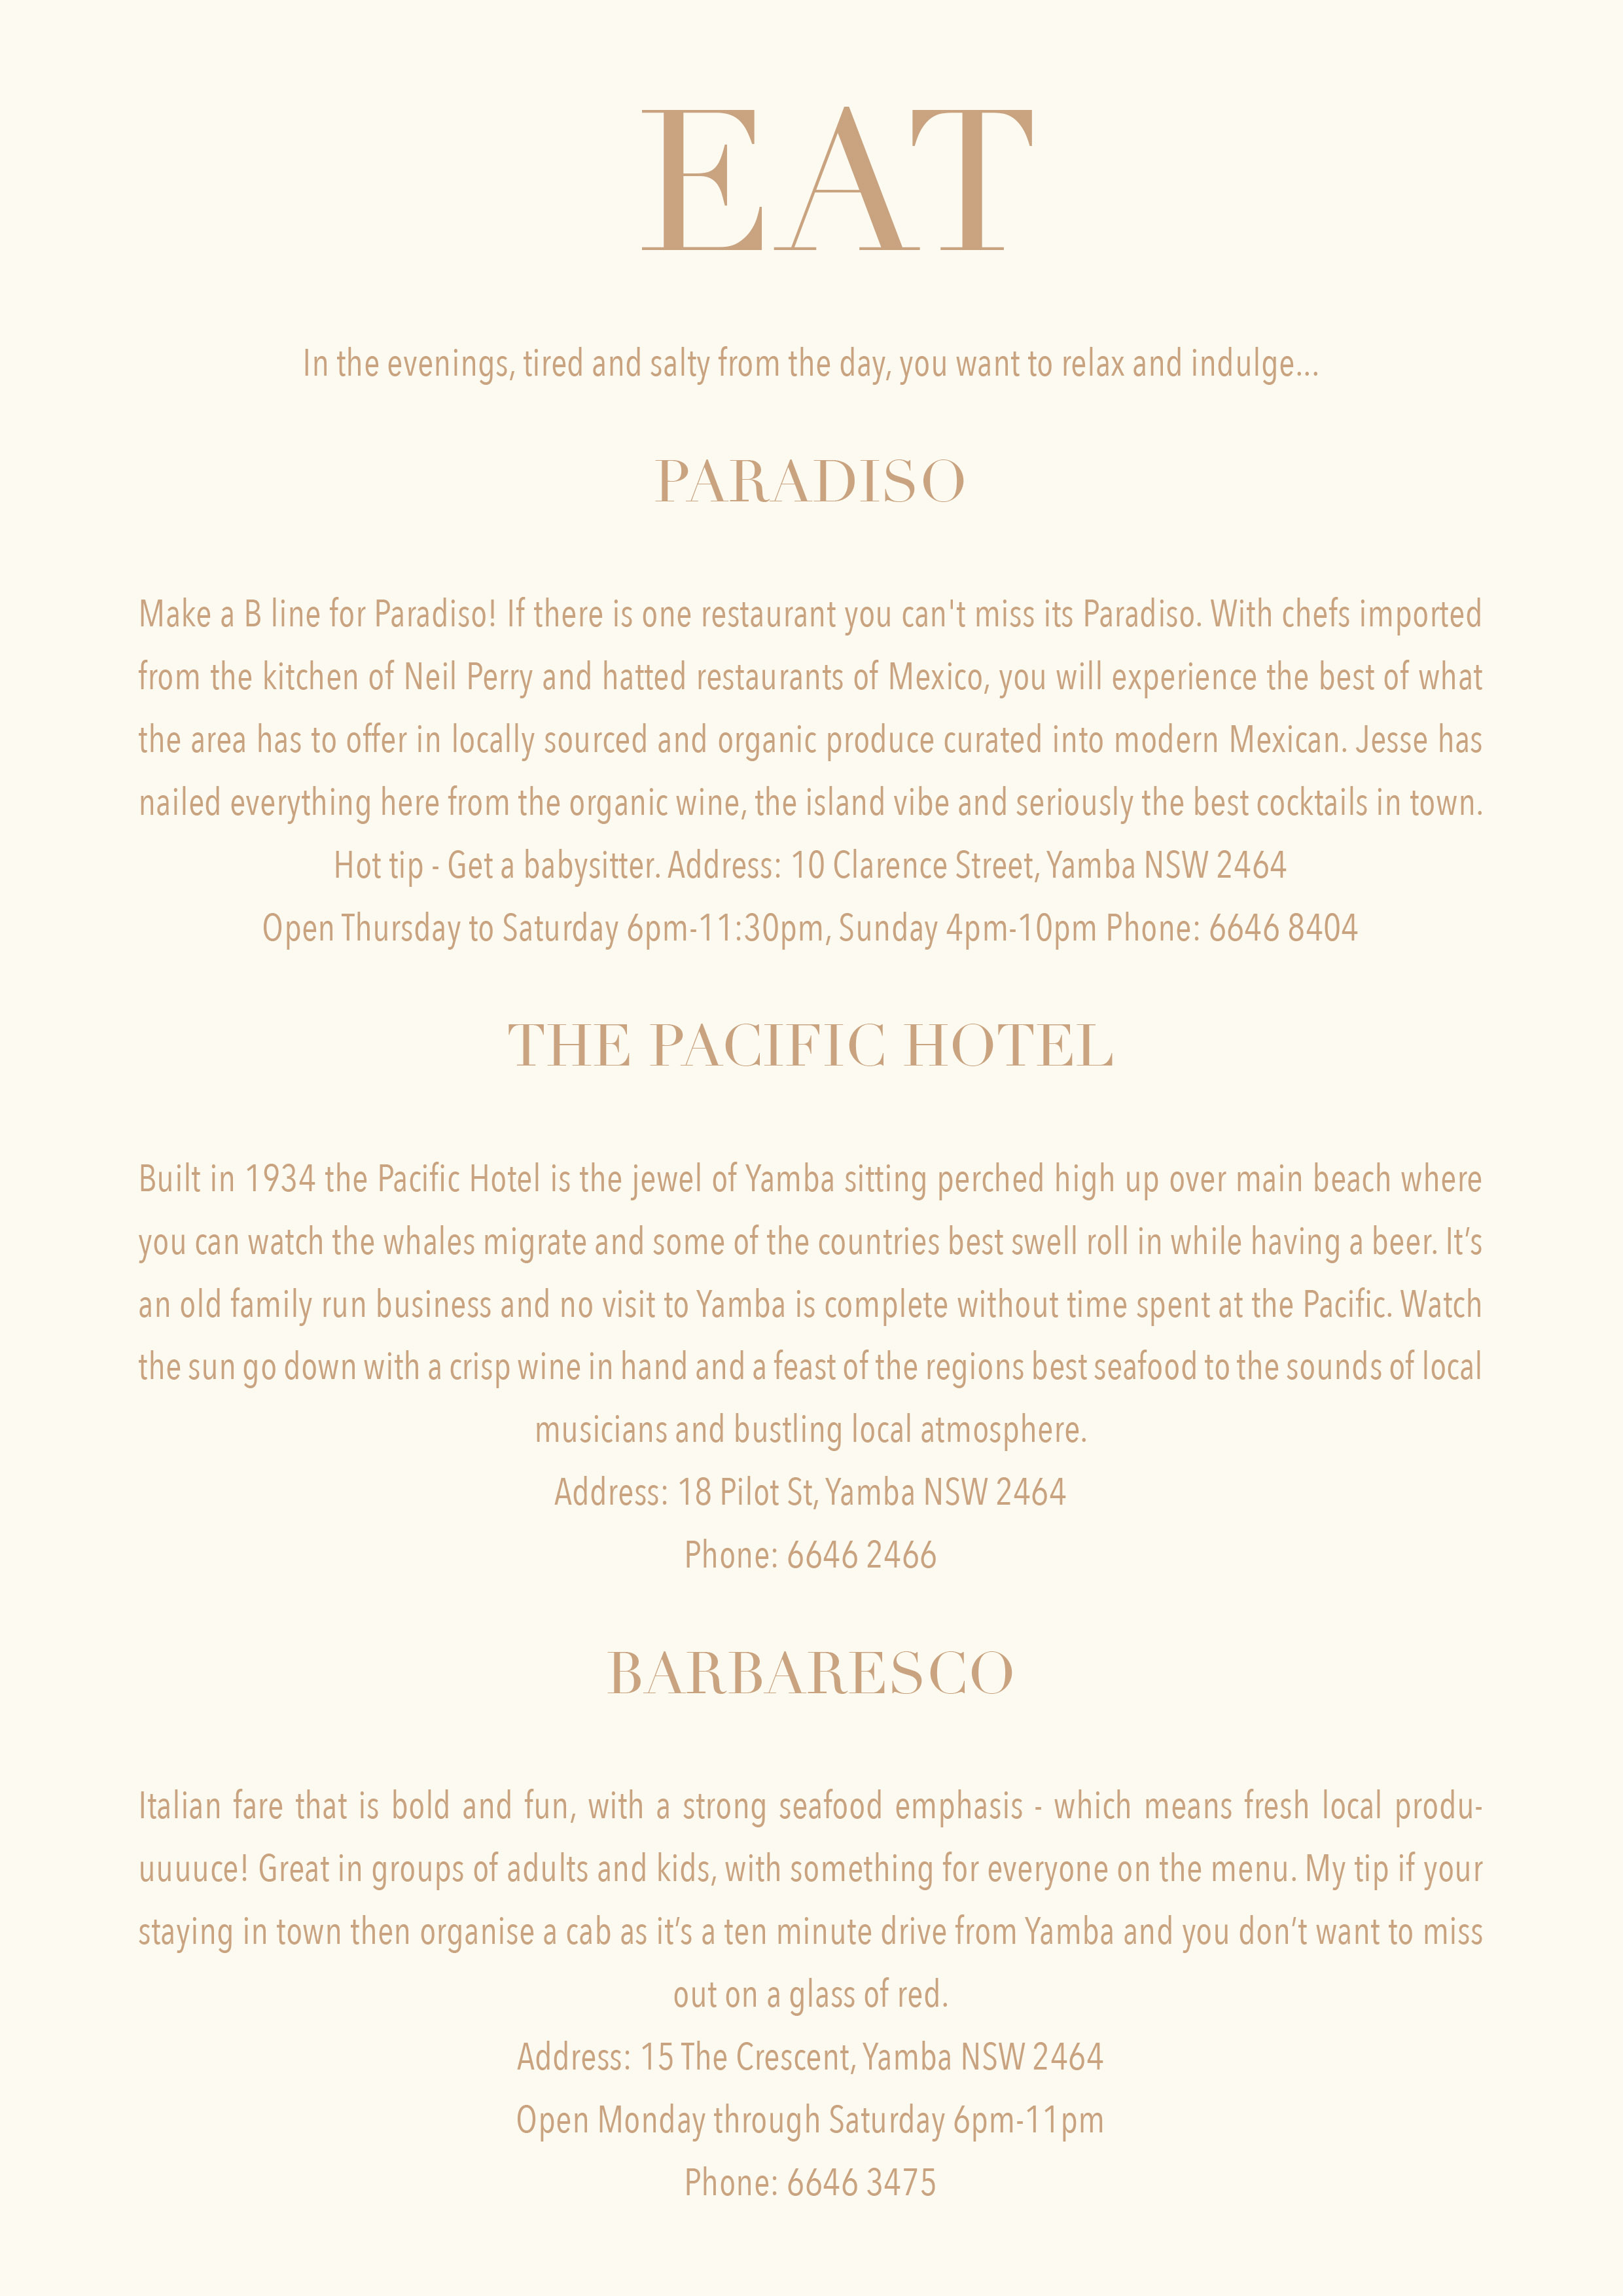 yamba travel guide nsw east coast beach holiday catgk captain and the gypsy kid eat paradisio the pacific hotel barbaresco eat